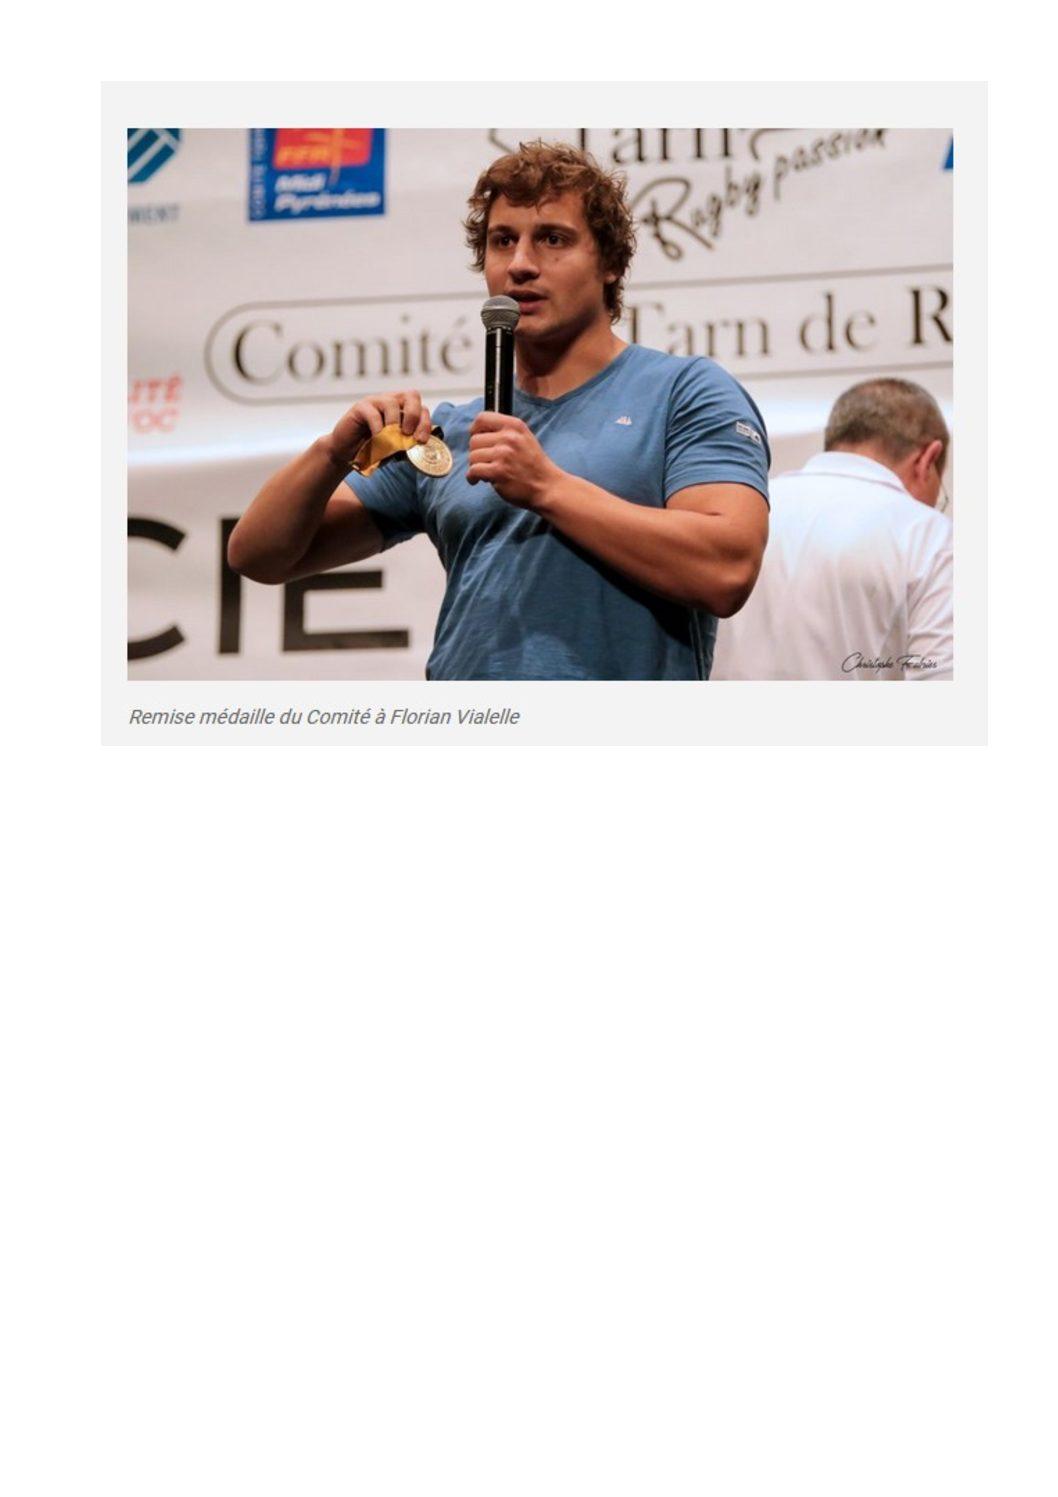 http://scg-rugby.com/wp-content/uploads/2018/06/TARN-10-pdf.jpg